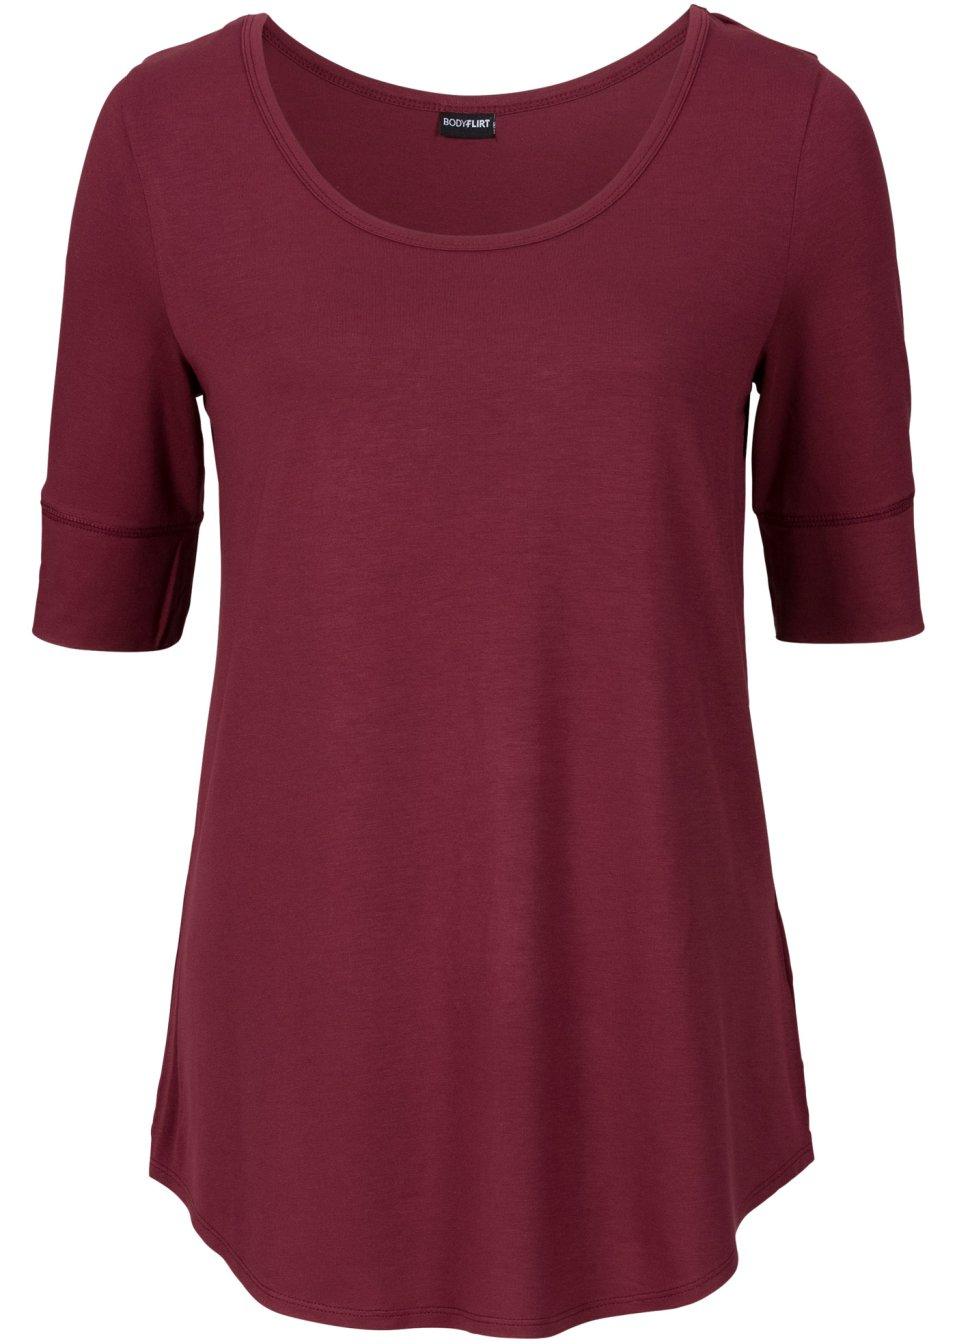 ba4f093f8c42 Damen Shirts in rot - für trendy Fashionvictims